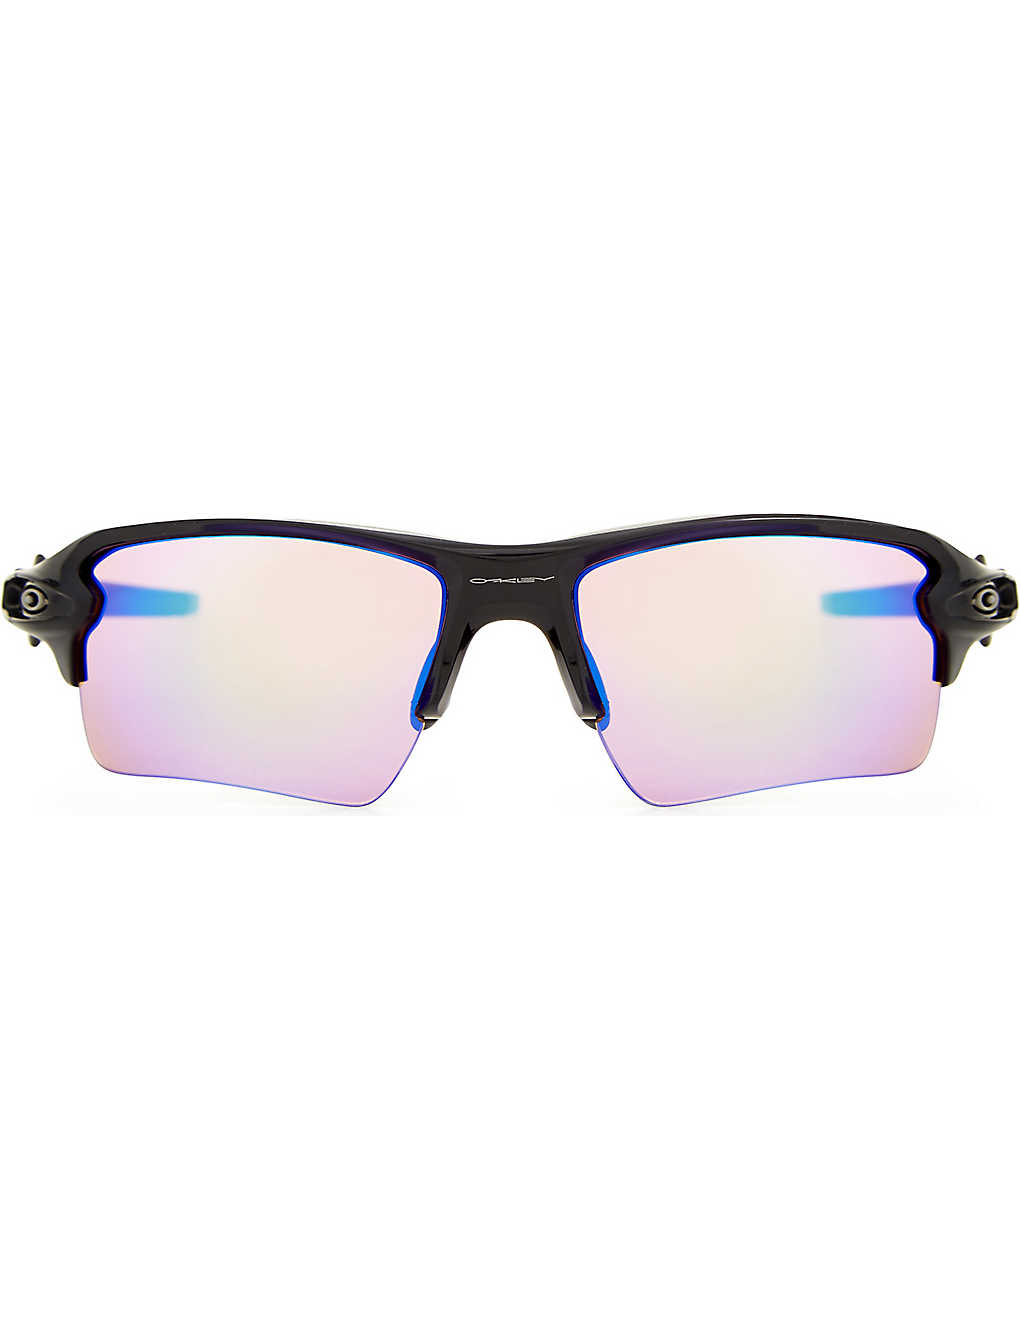 11572cc3f7f3 OAKLEY - OO9188 Flak 2.0 XL square-frame sunglasses | Selfridges.com